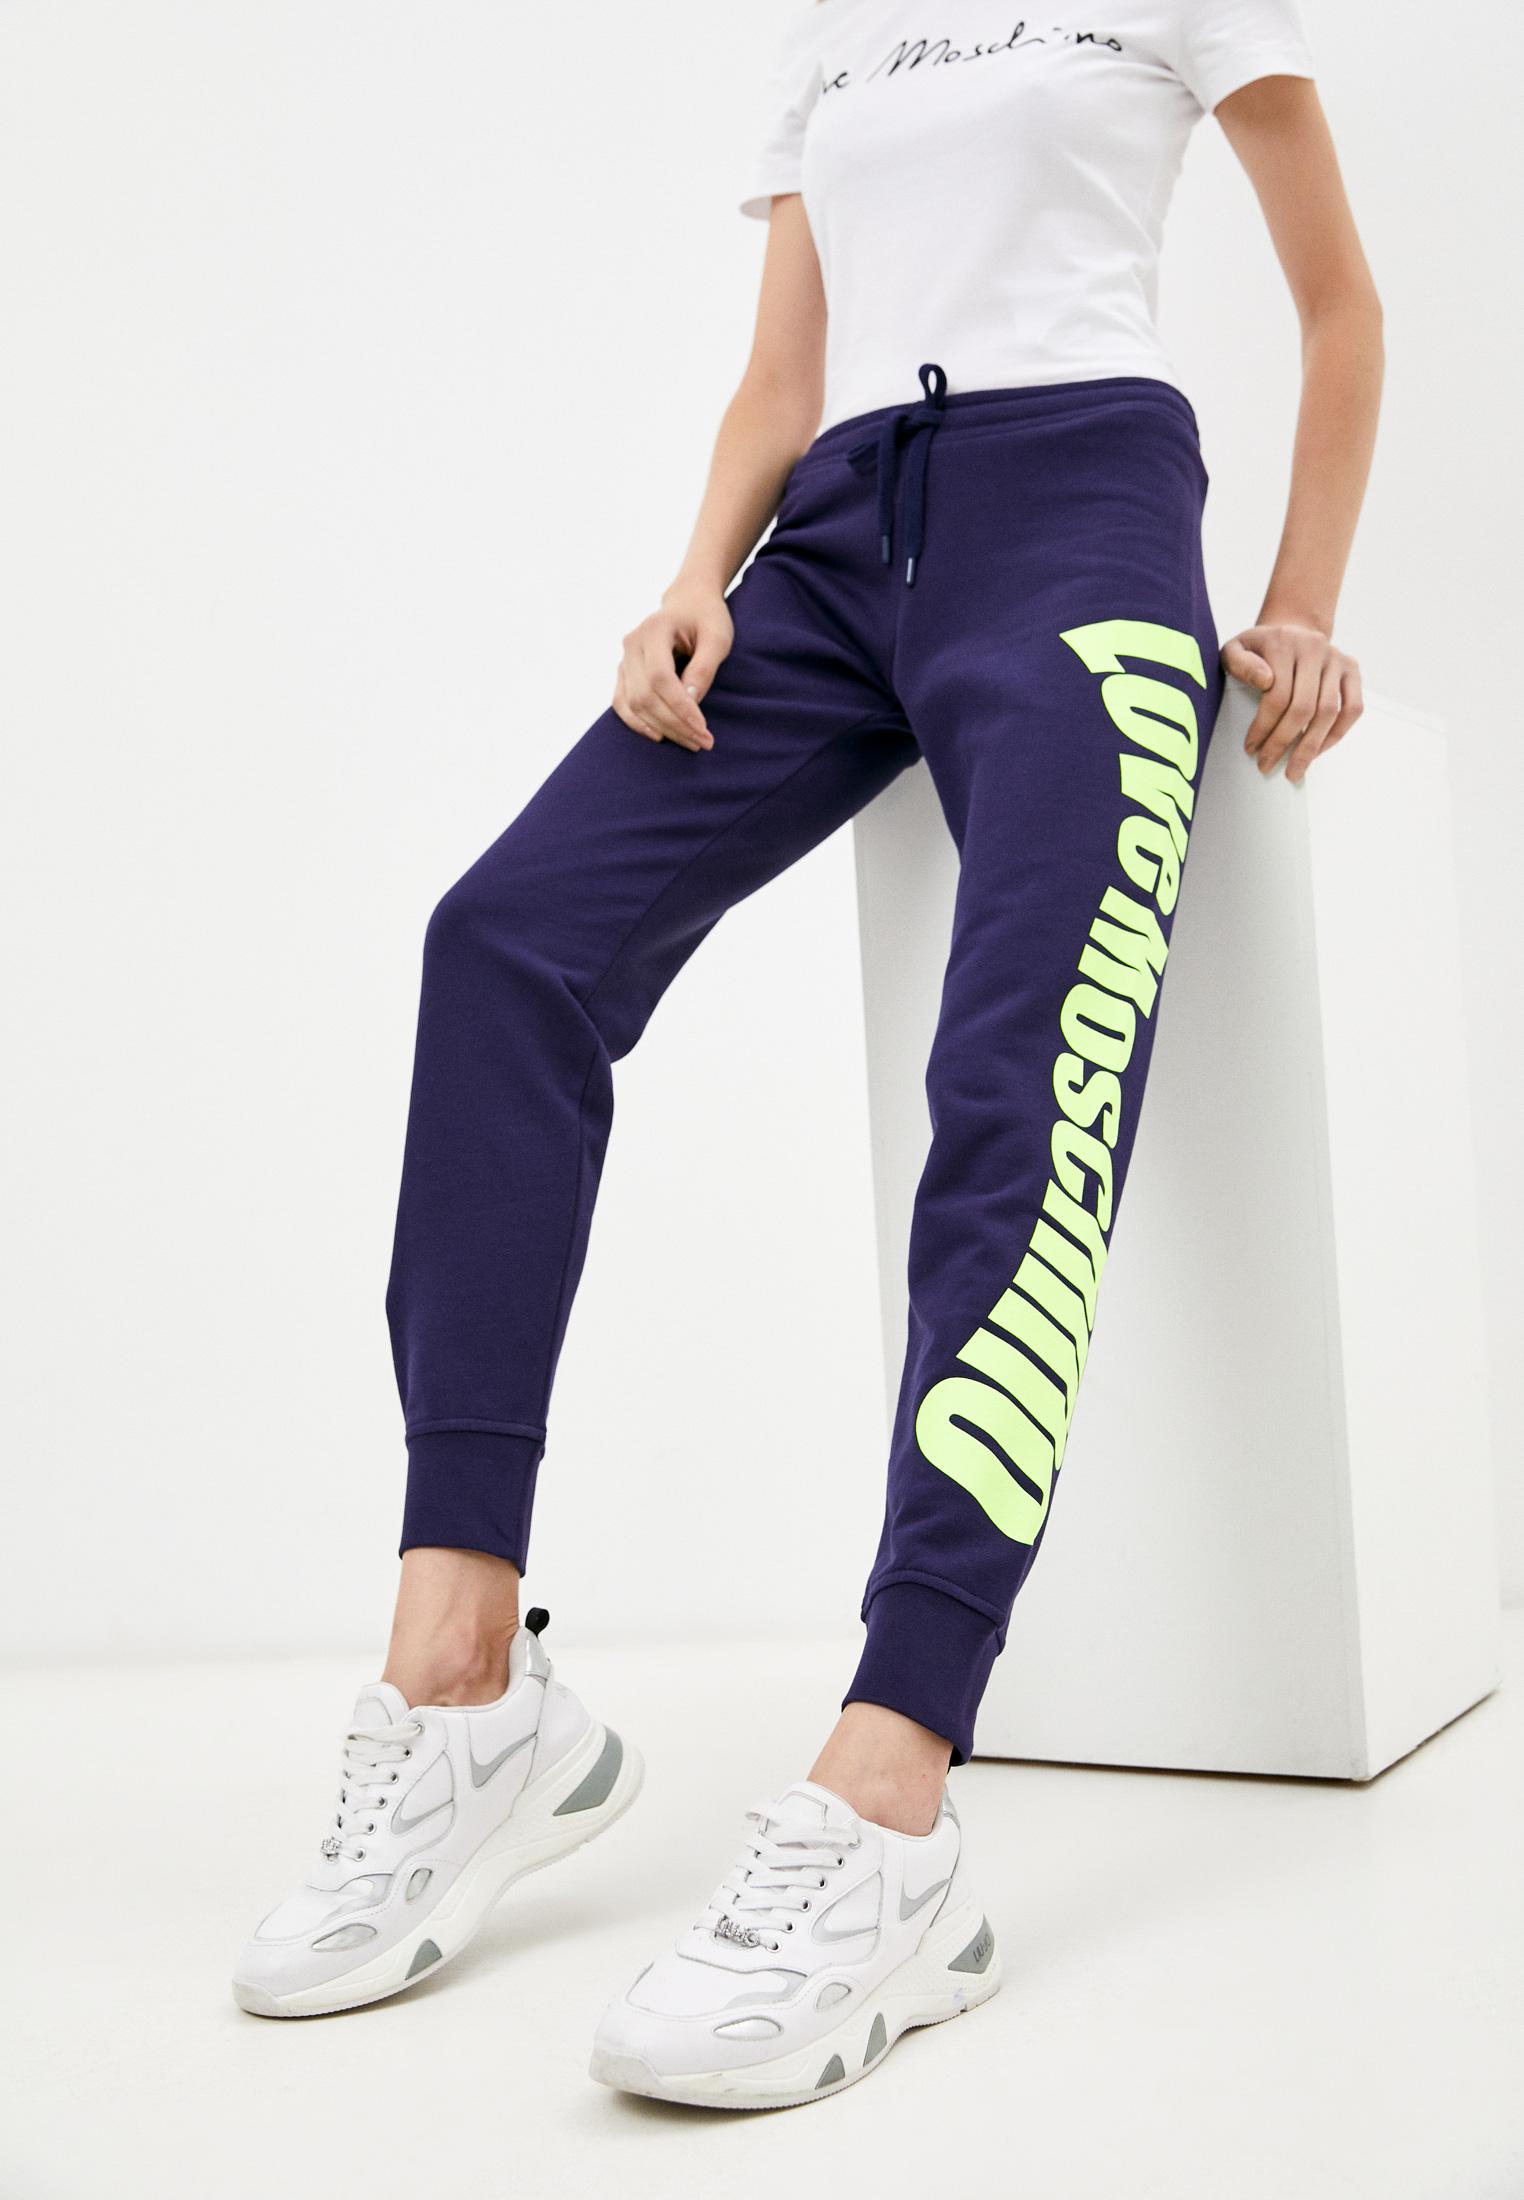 Женские спортивные брюки Love Moschino W 1 424 18 M 4055